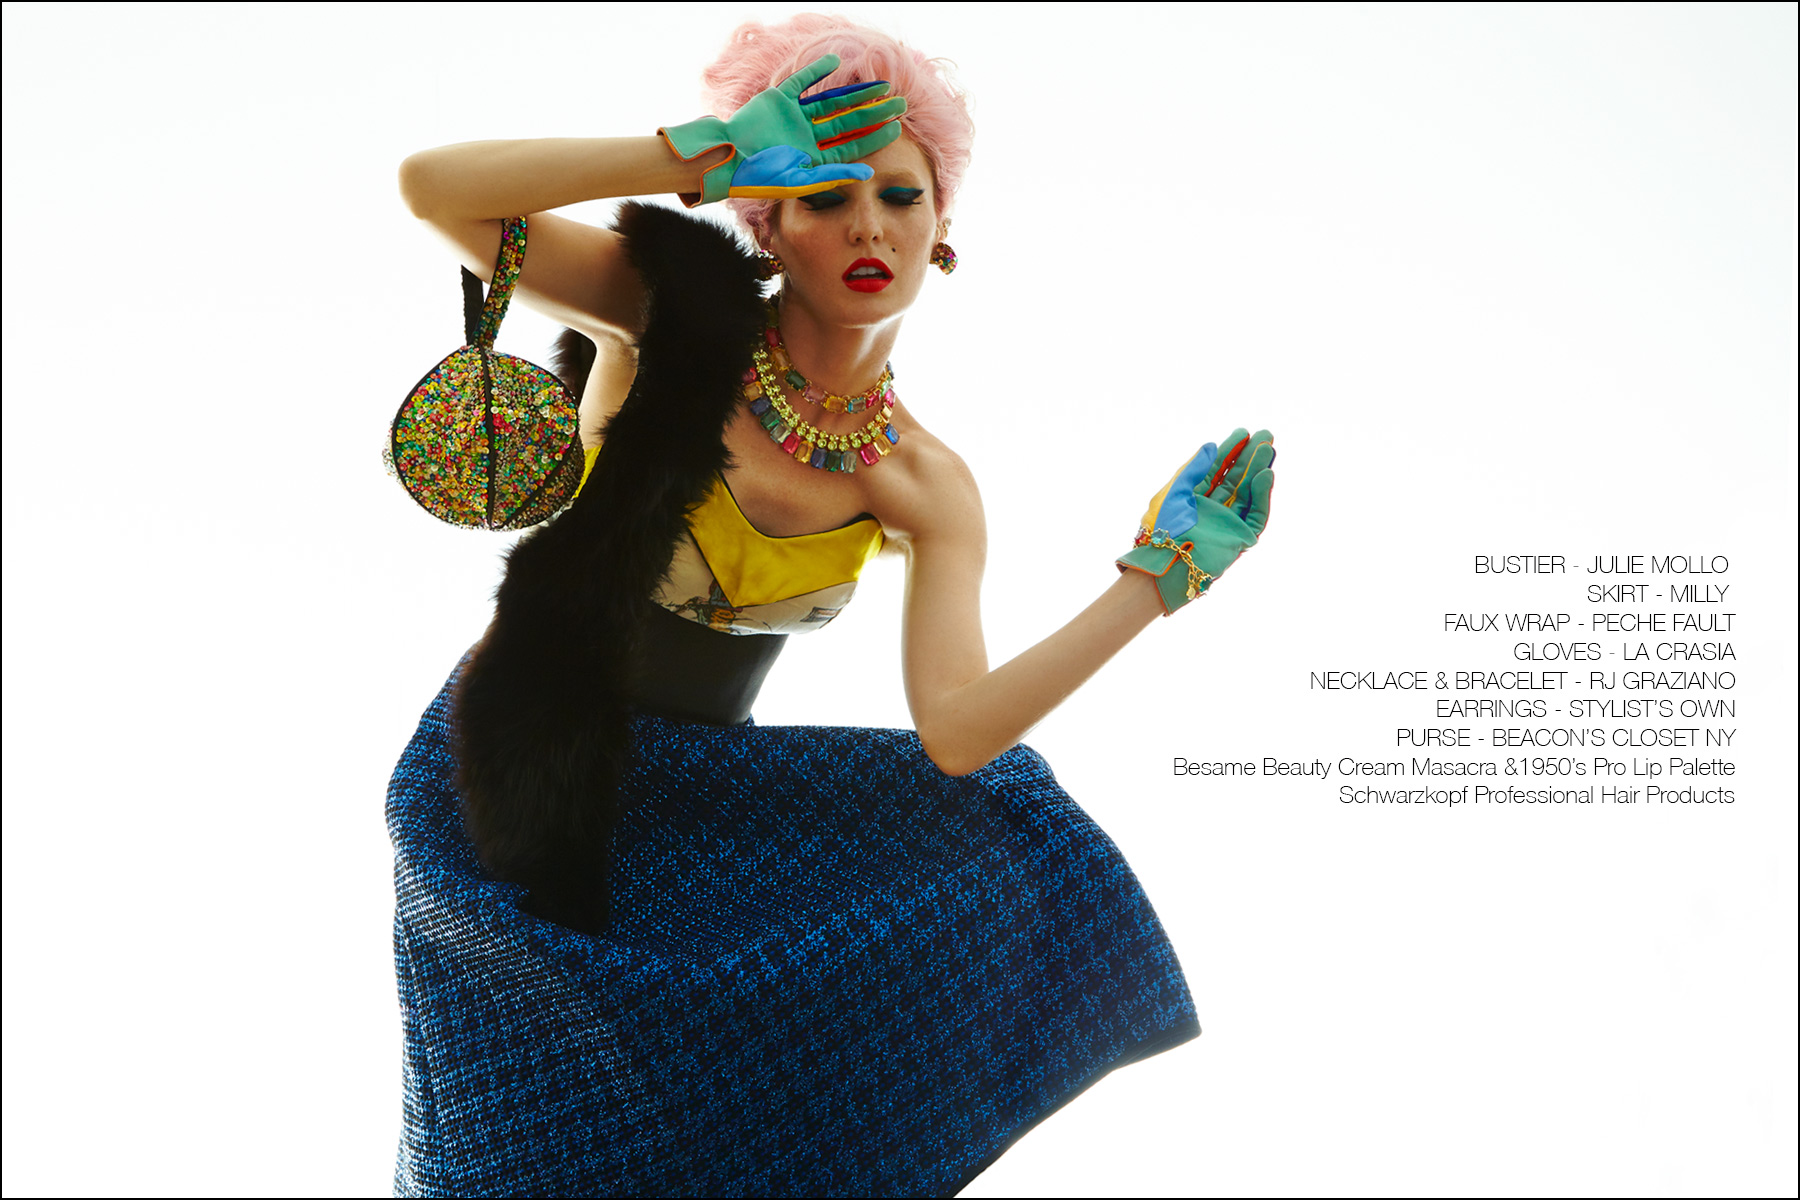 Model Audrey Kitching